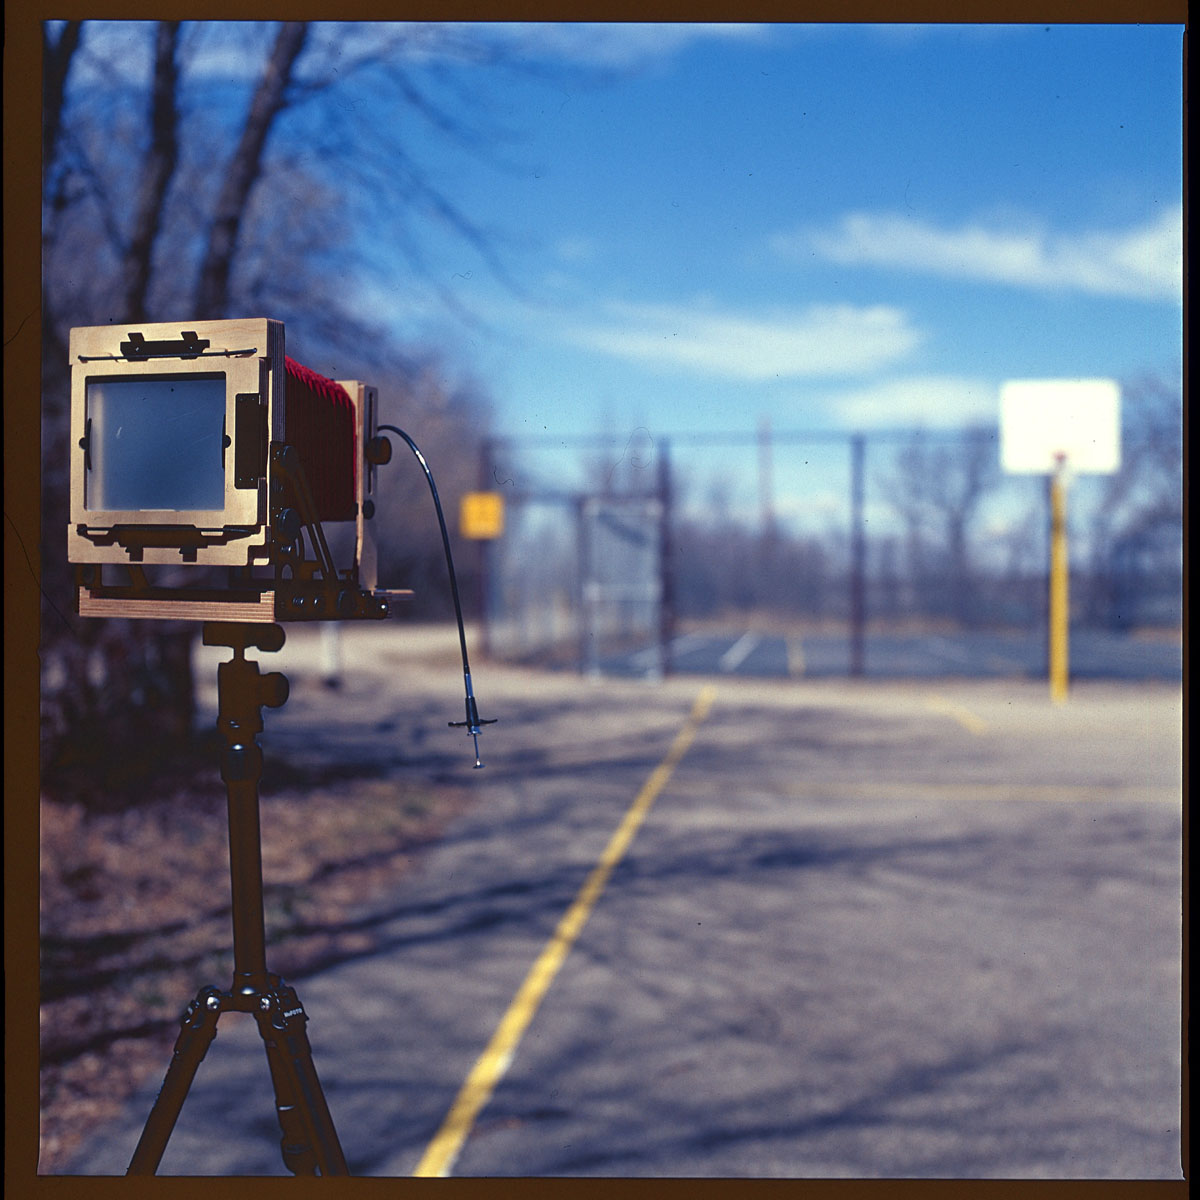 Intrepid Field Camera on a nice day  Hasselblad 500CM  Kodak E100VS